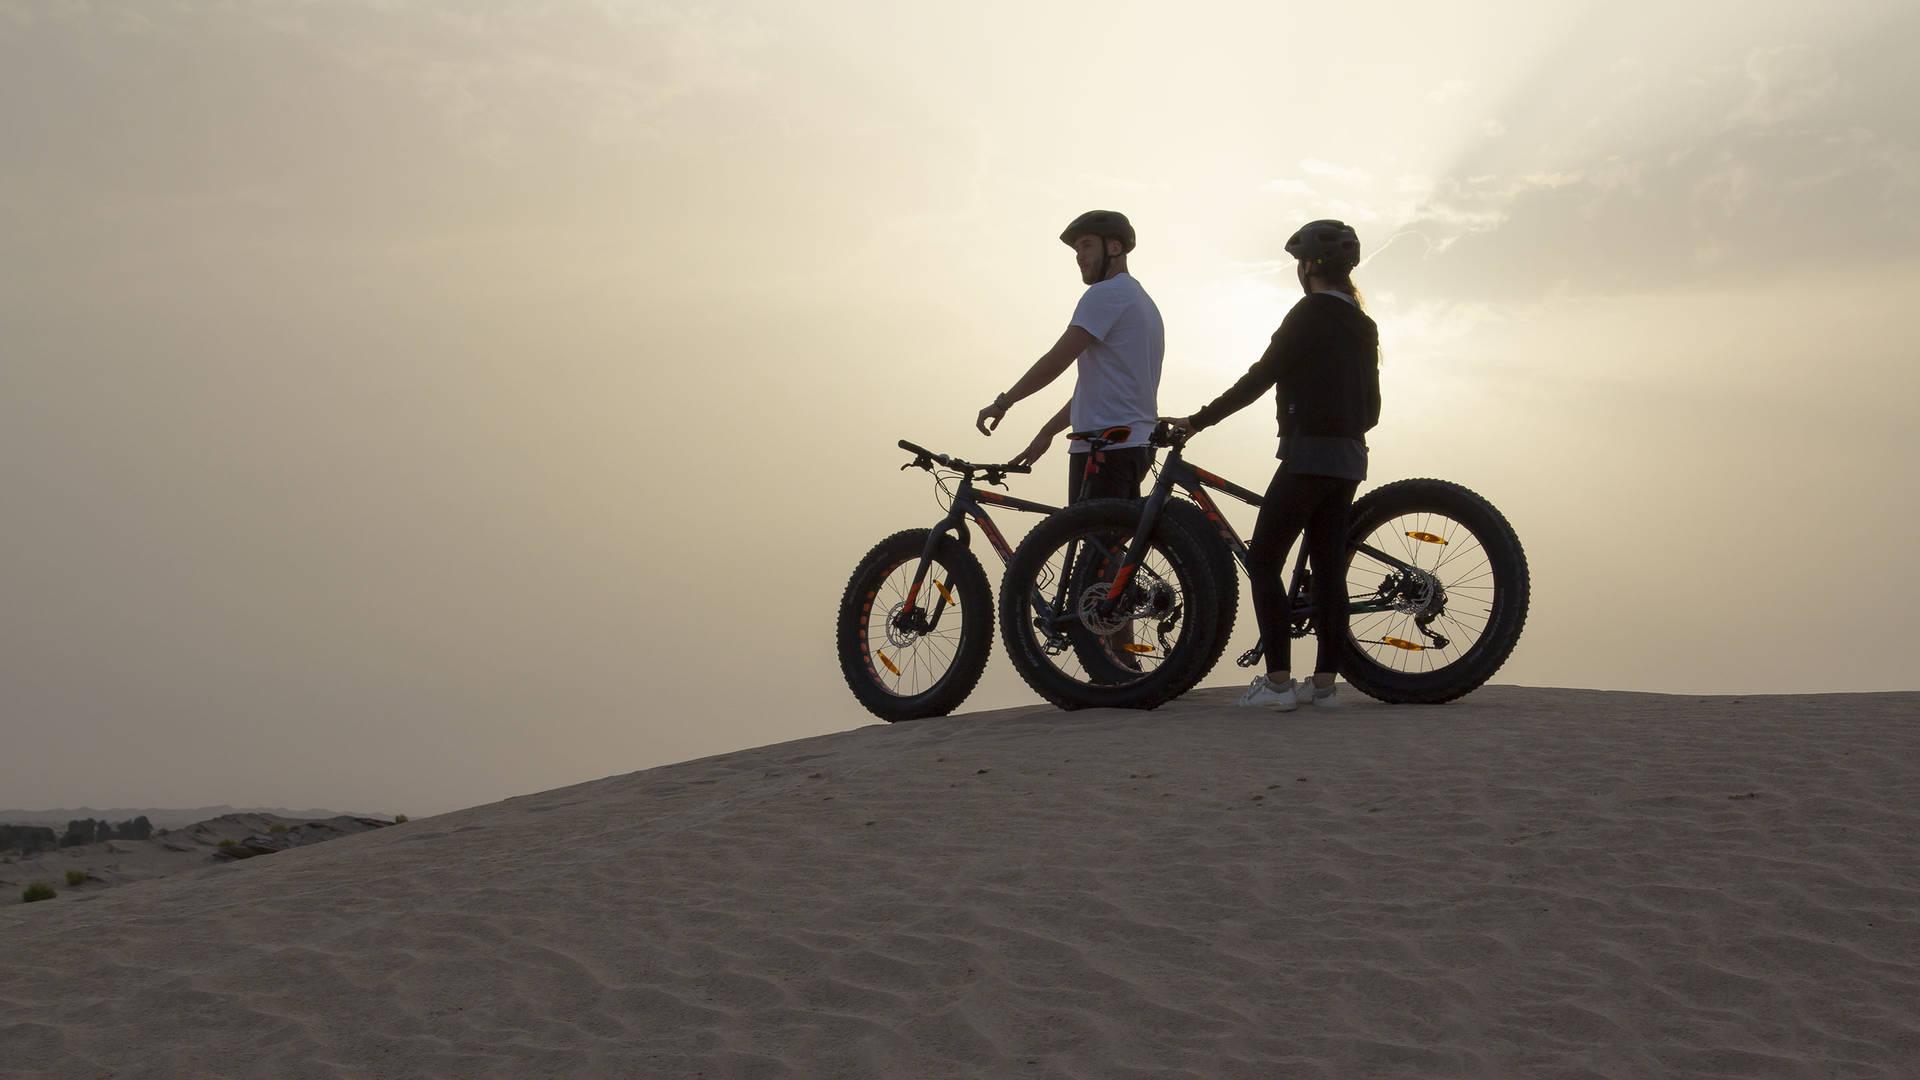 desert reasons to visit Dubai